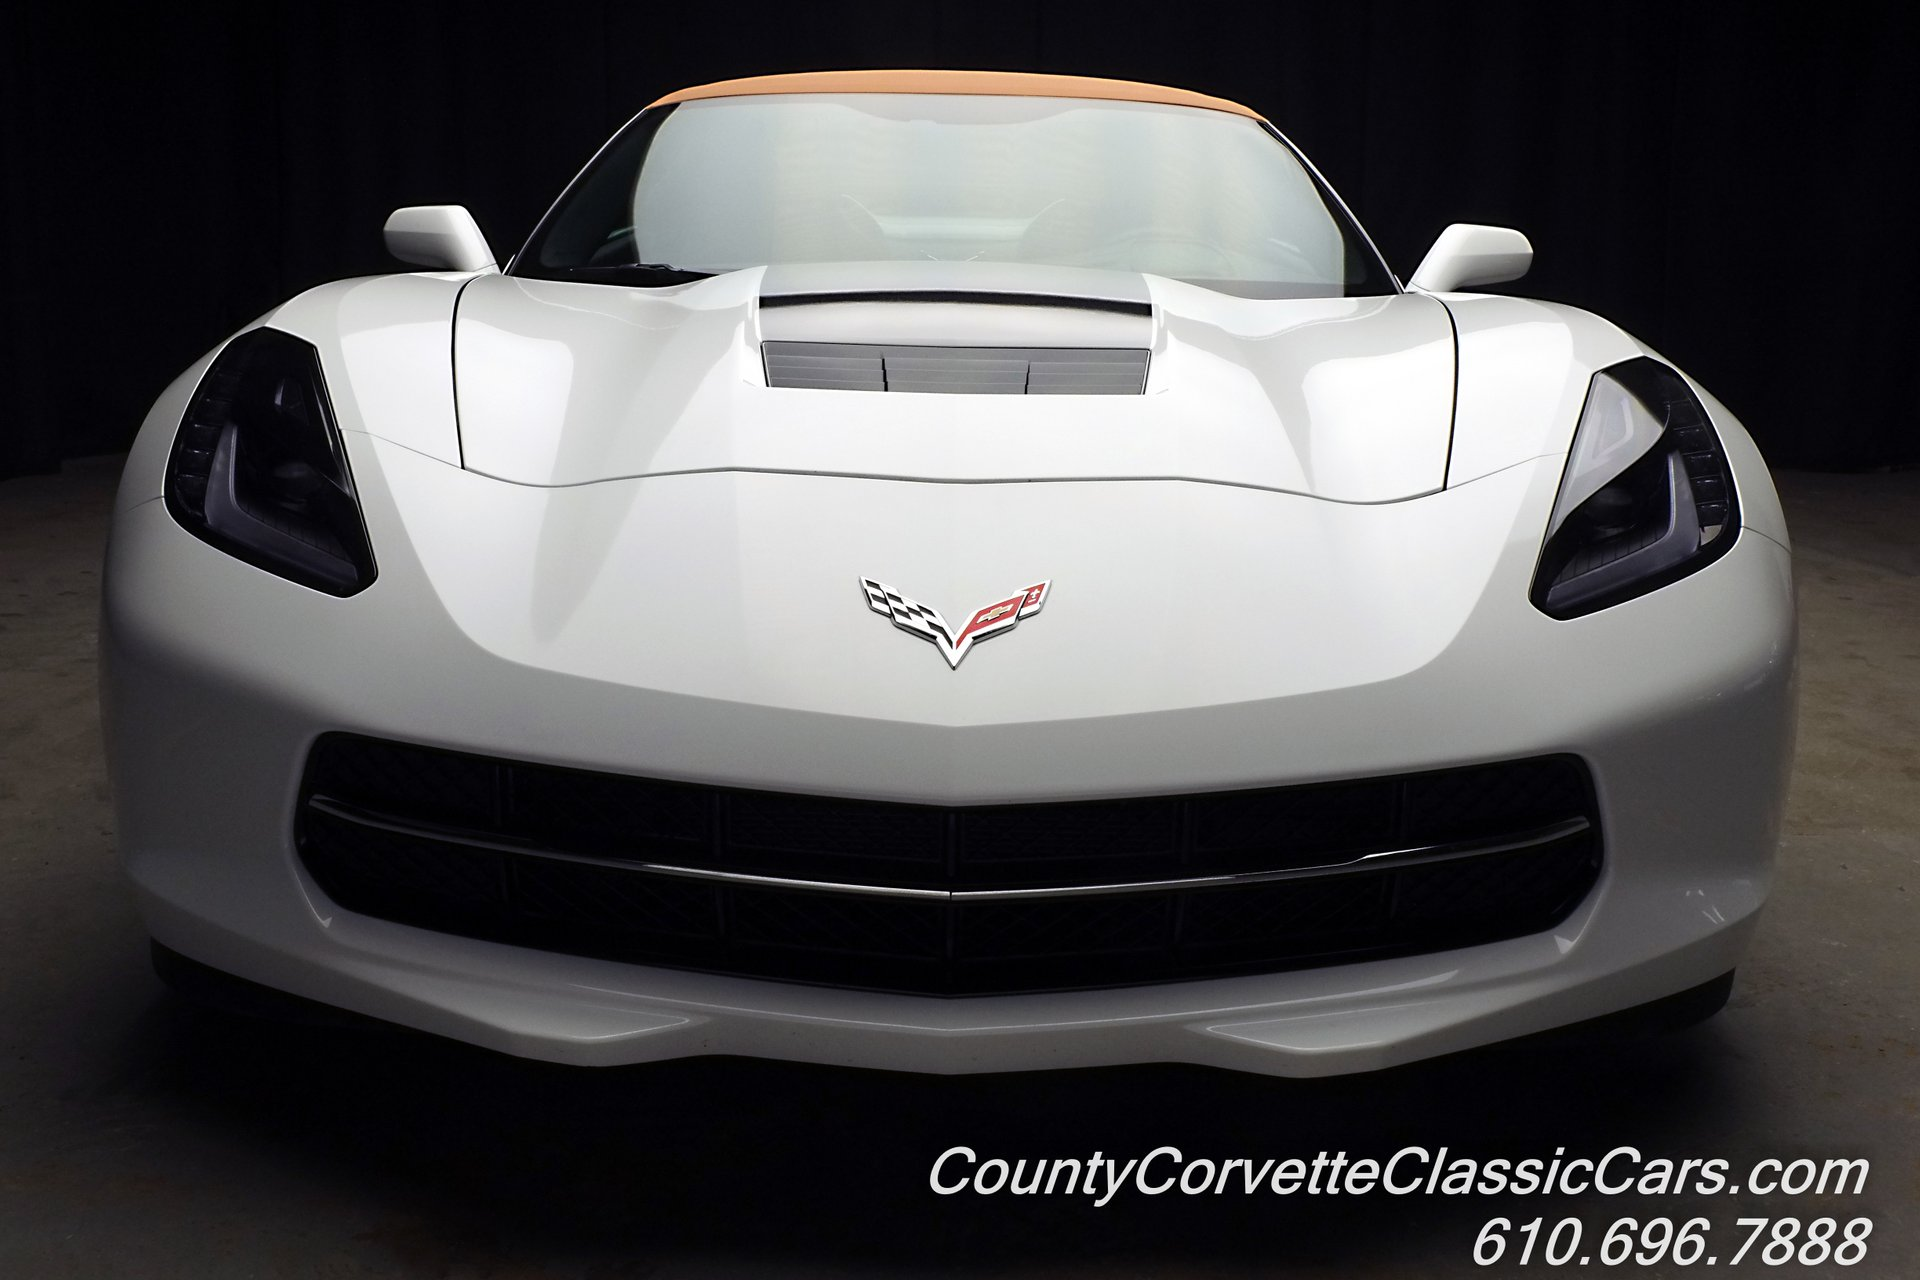 2014 chevrolet corvette sting ray